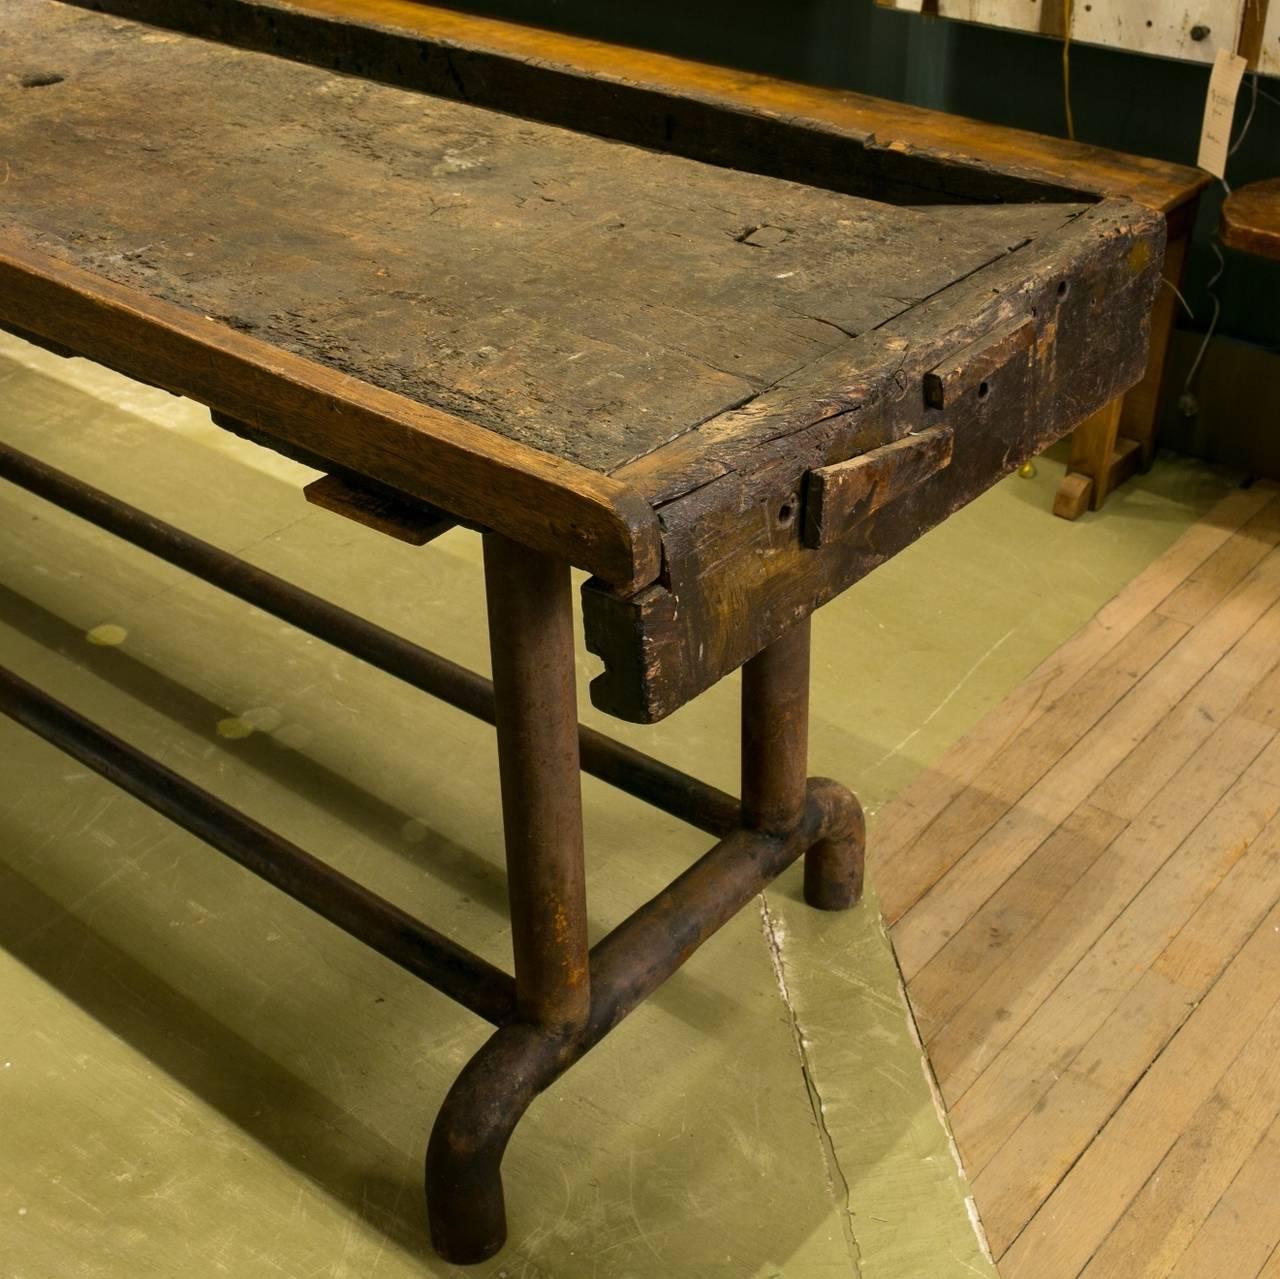 Original Antique Oak Tabletop From Holland, Circa 1900s. Includes The  Original Metal Clamp/